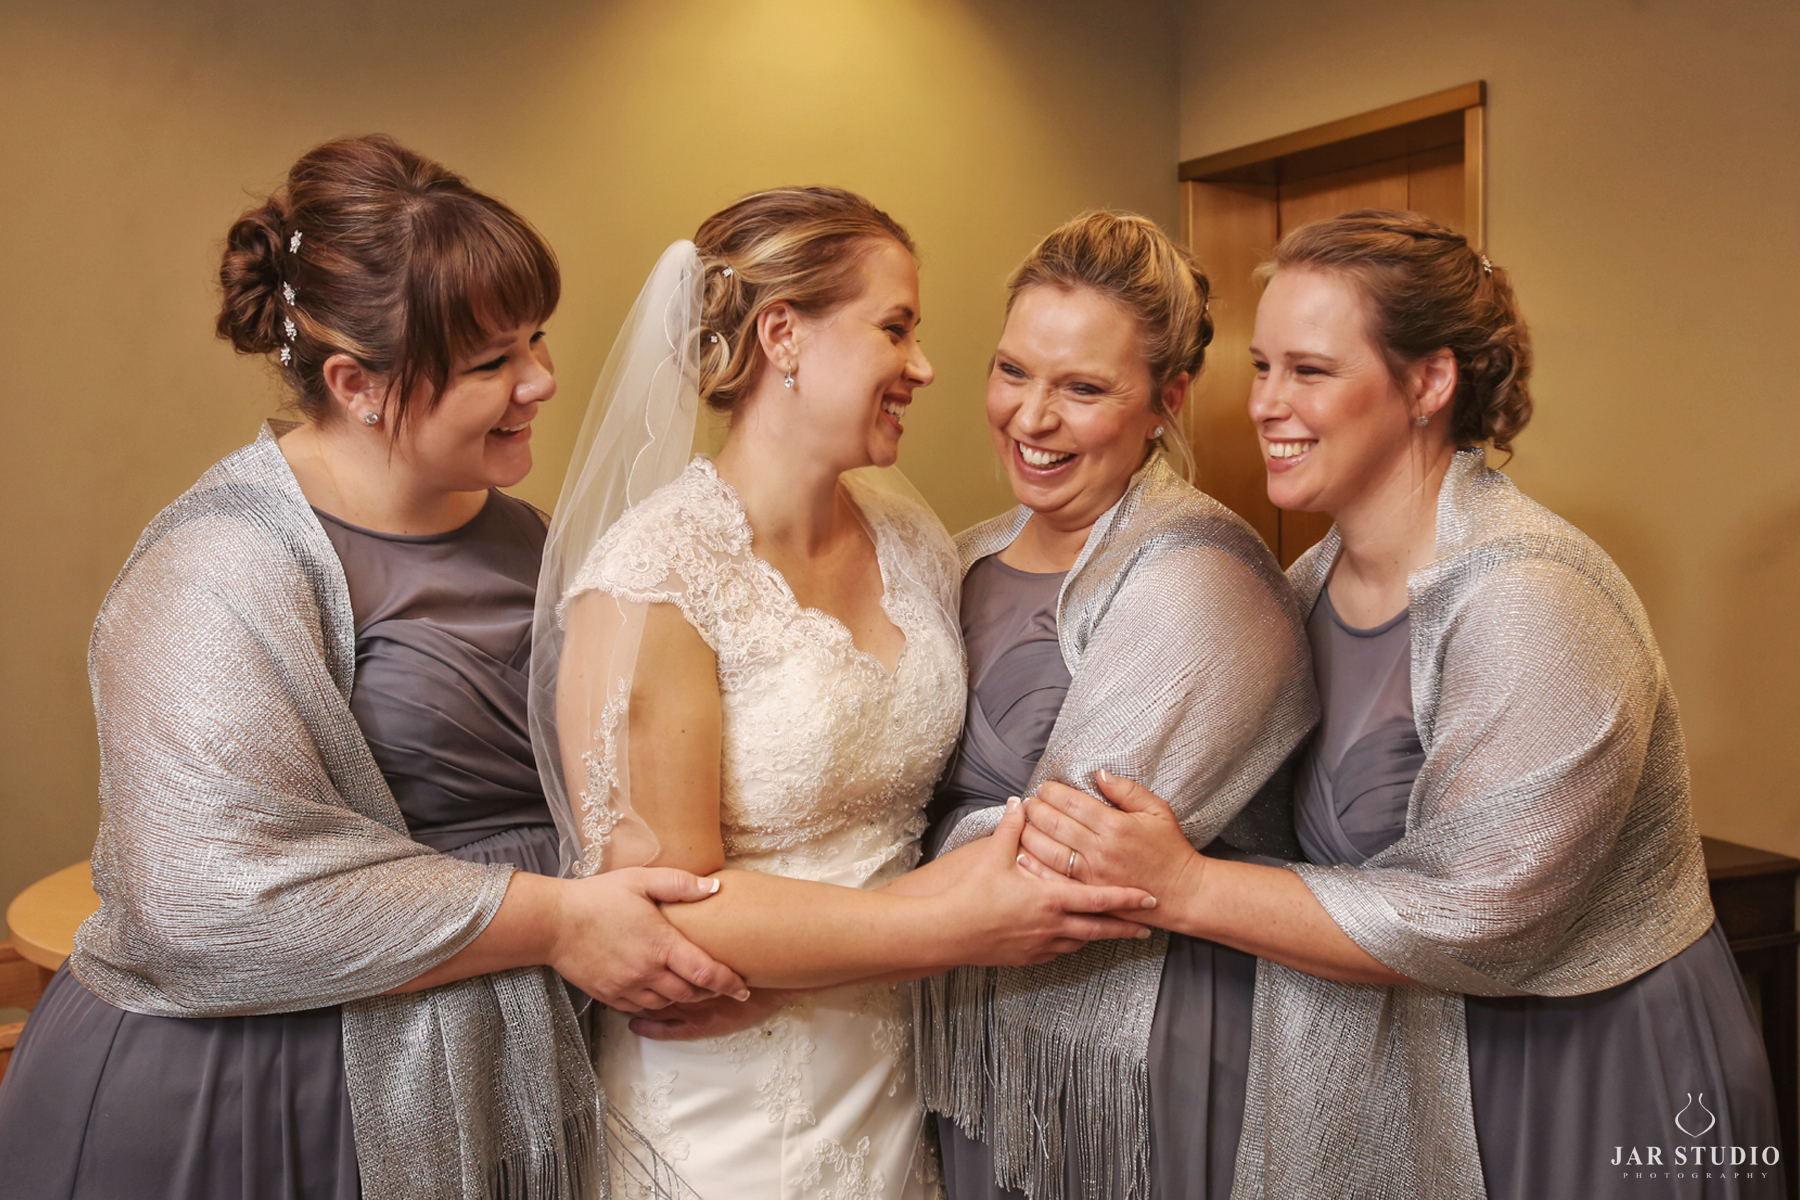 09-bride-with-sisters-happy-celebrating-wedding-day-jarstudio.jpg